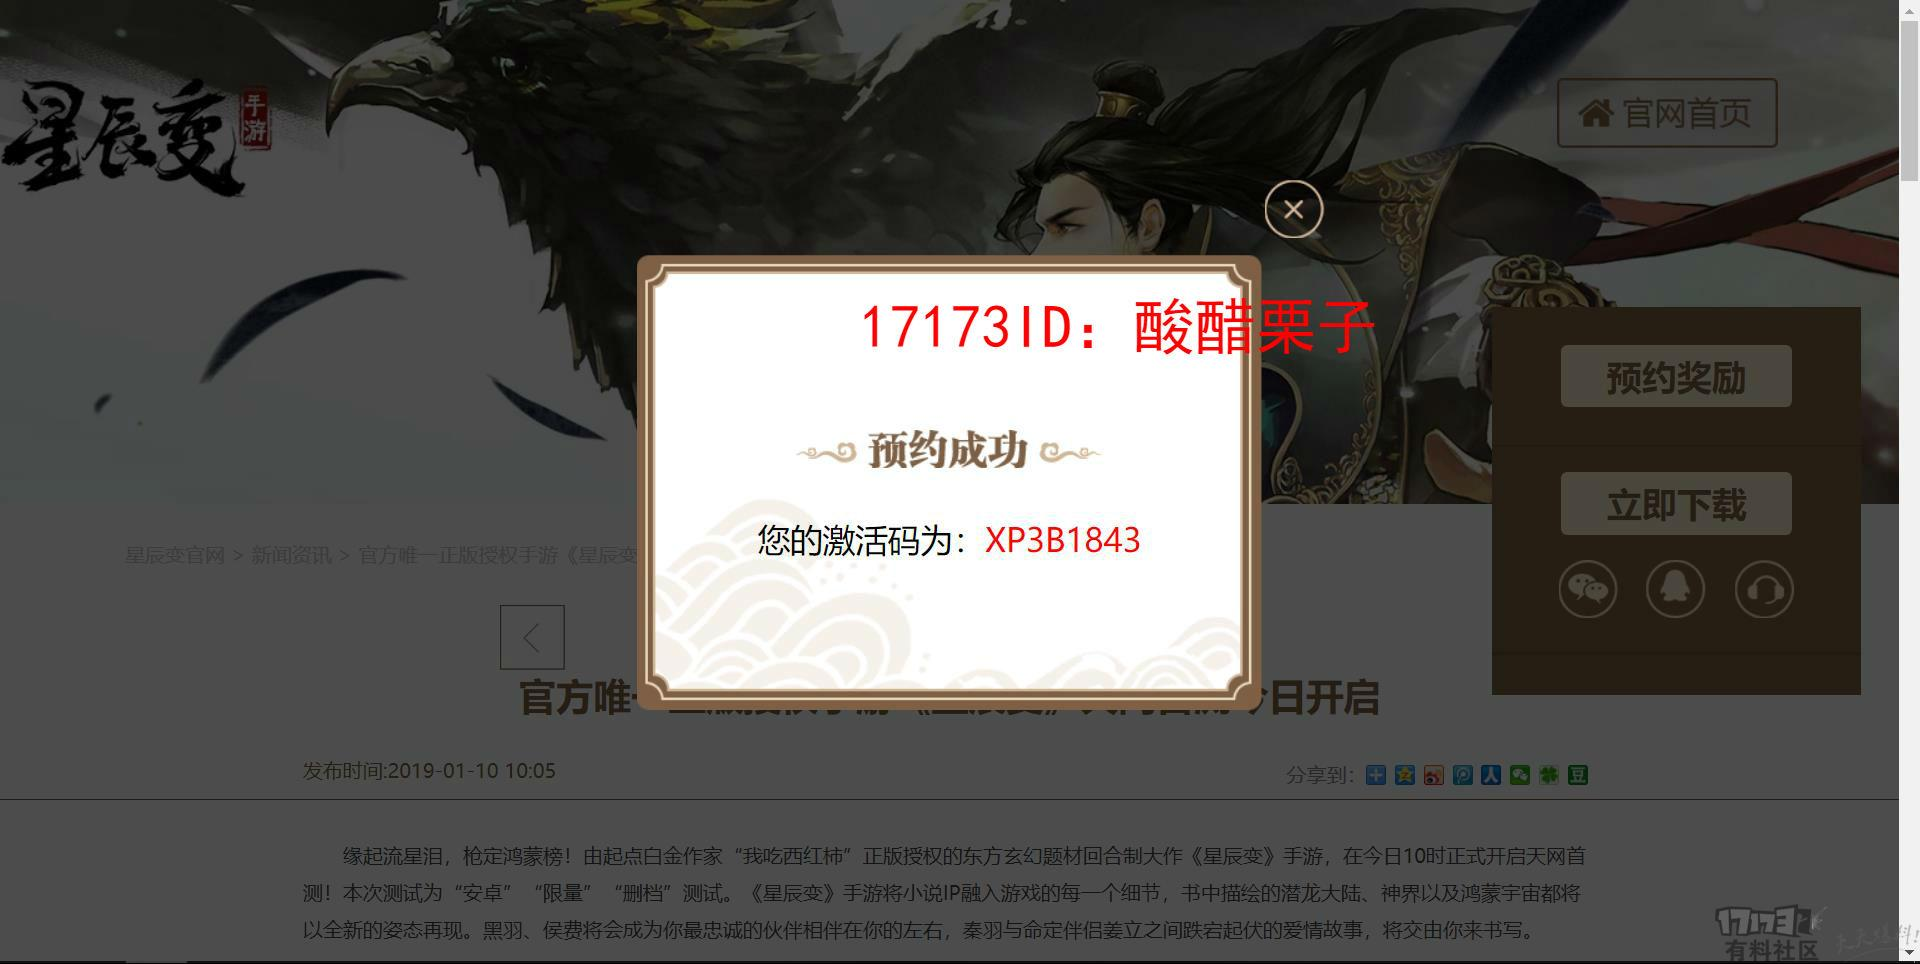 QQ浏览器截图20190110175607.jpg